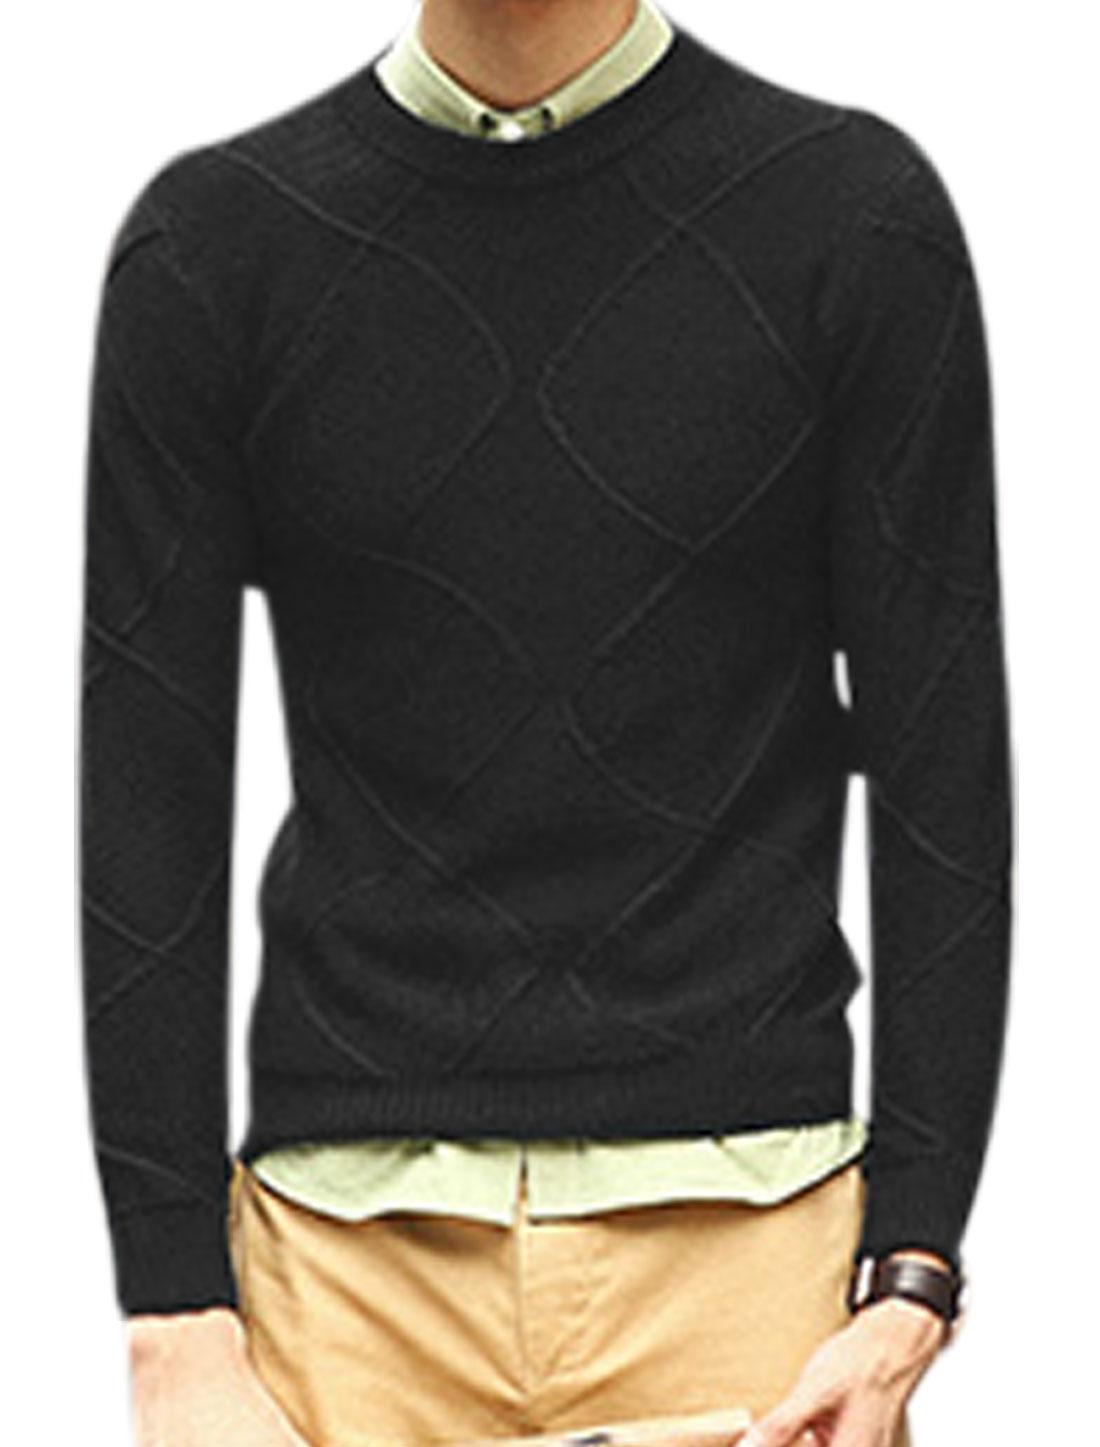 Men Argyle Design Ribbed Cuffs w Hem Casual Sweater Black M